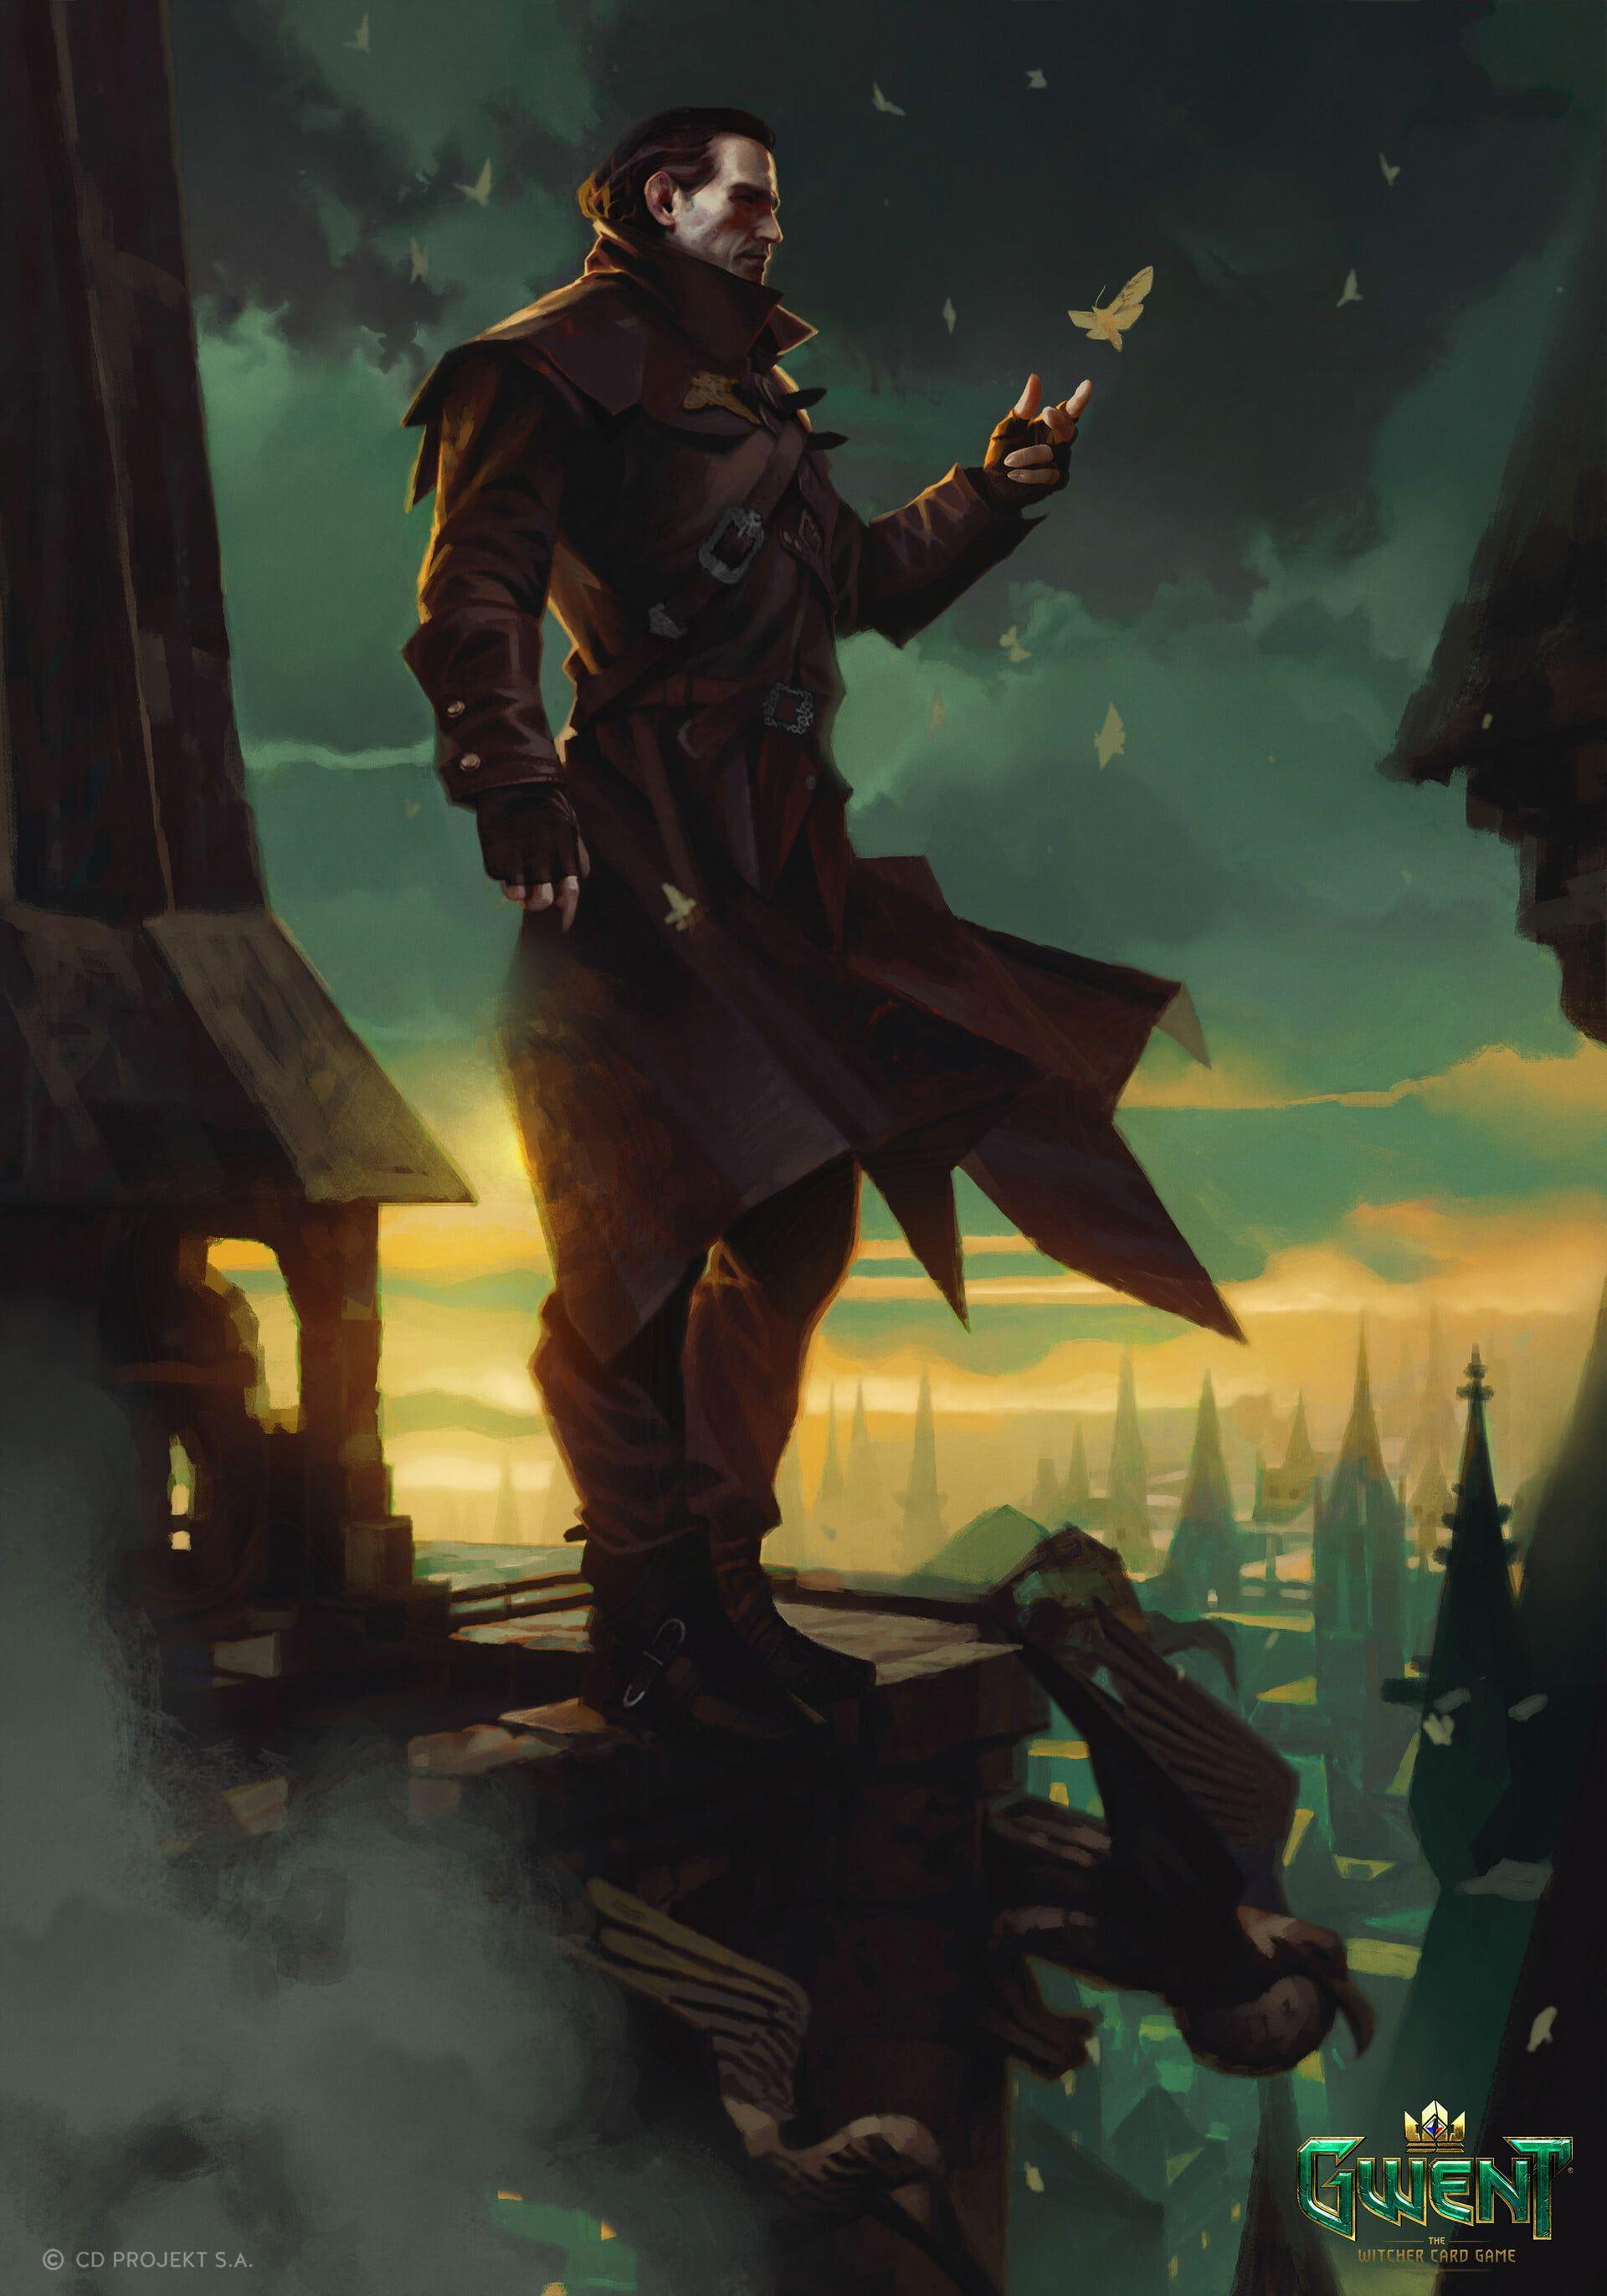 Digital Art Artwork Portrait Display Video Games Dettlaff The Witcher 3 Wild Hunt Hearts Of Stone The Witcher 3 Wild Hun Witcher Art Vampire Art Game Art